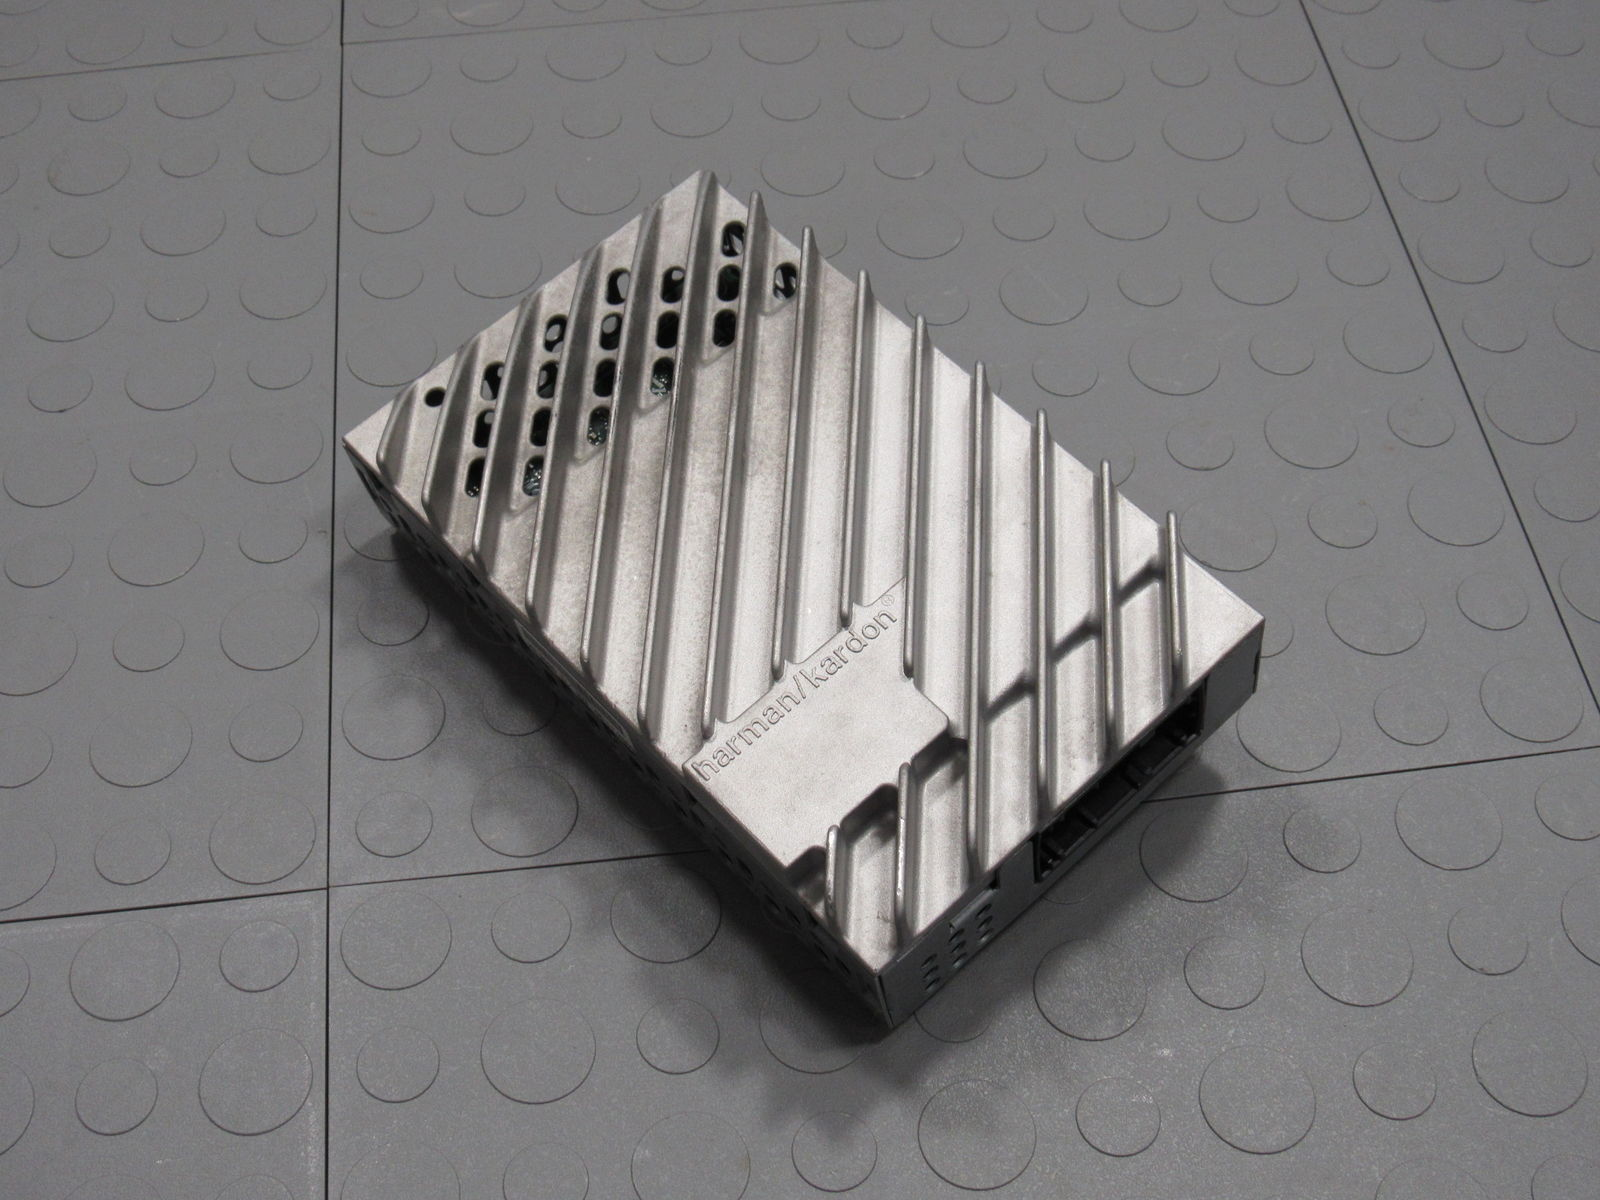 10 Mini Cooper R56 Harman Kardon Audio Radio Stereo Amplifier Amp 9